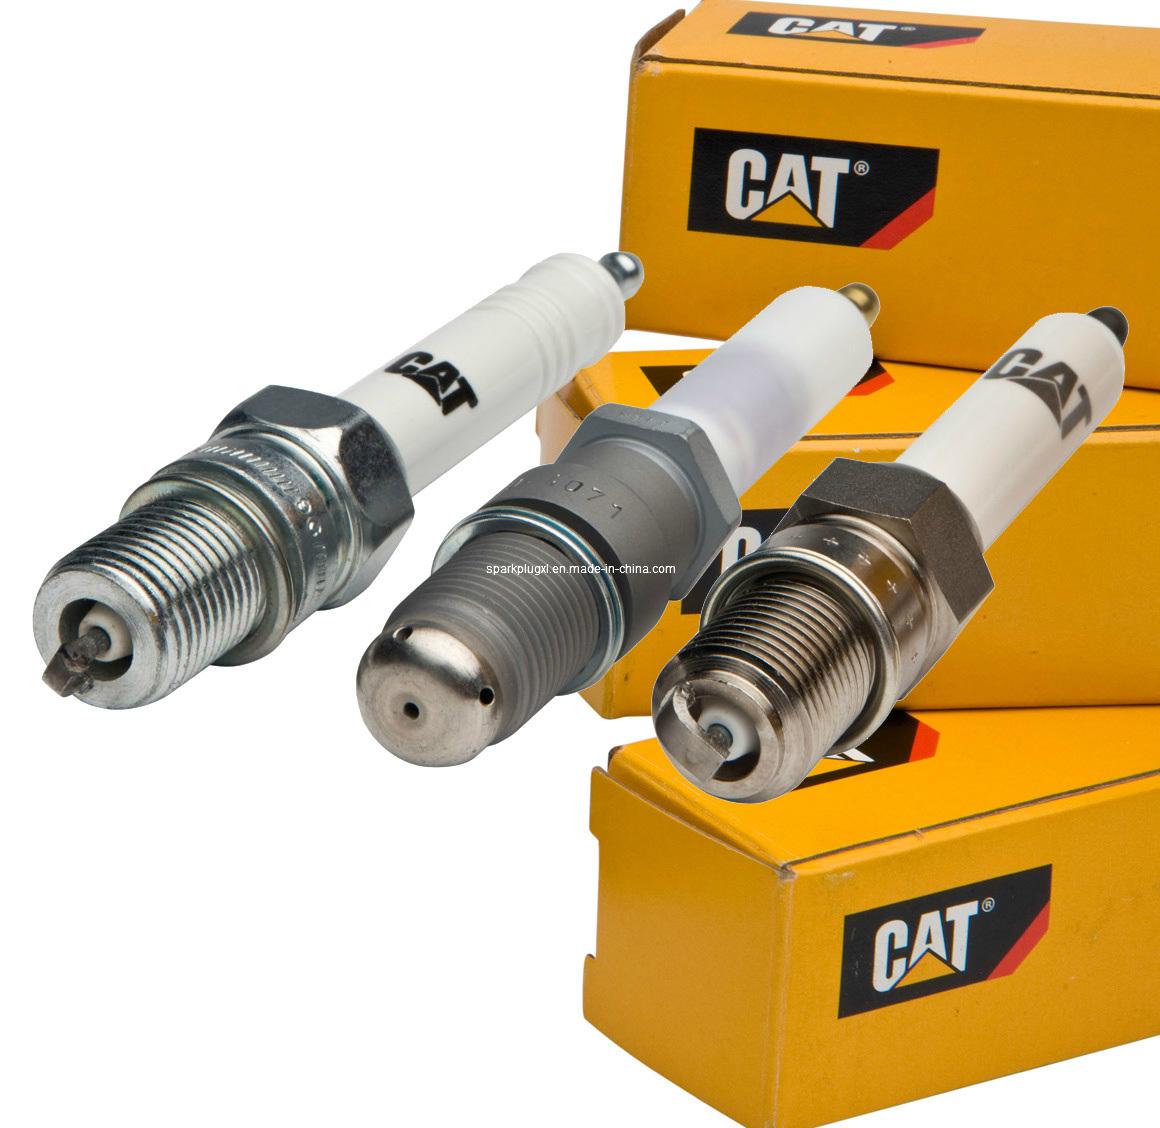 Cat Spark Plug 194-8518